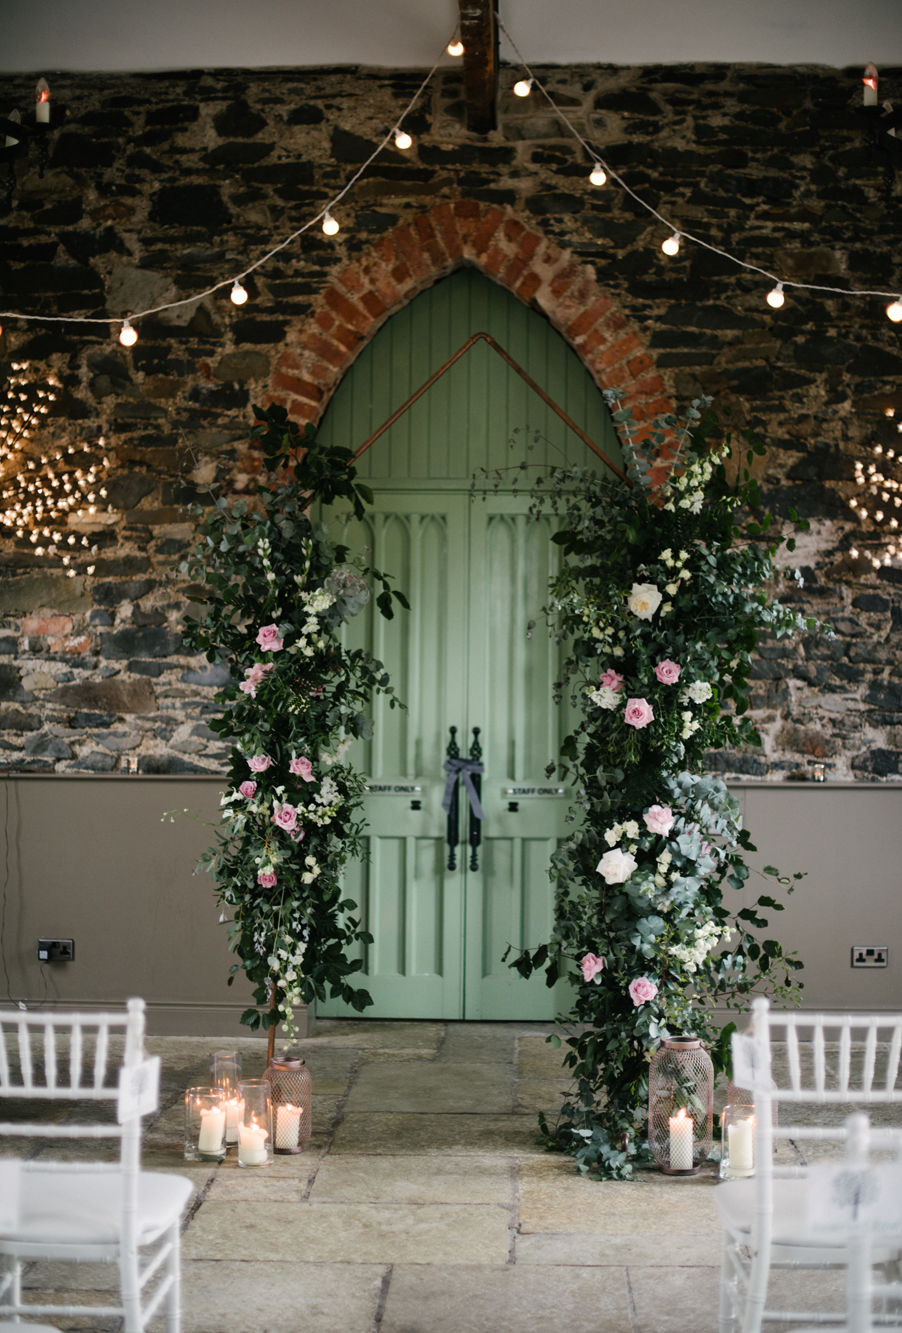 Orange_tree_house_Wedding_you_them_us_inspire_Weddings_13.jpg